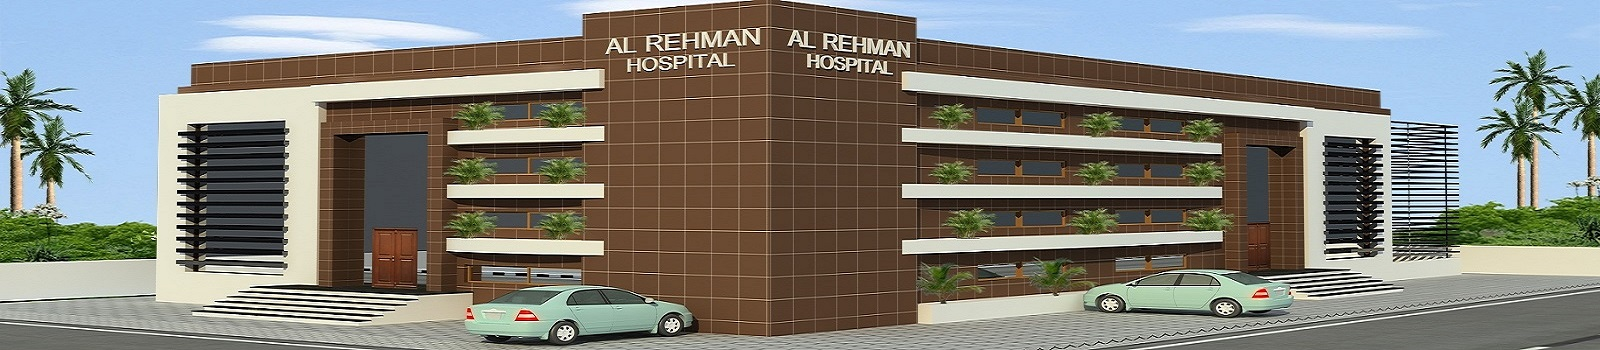 Al rahman hospital